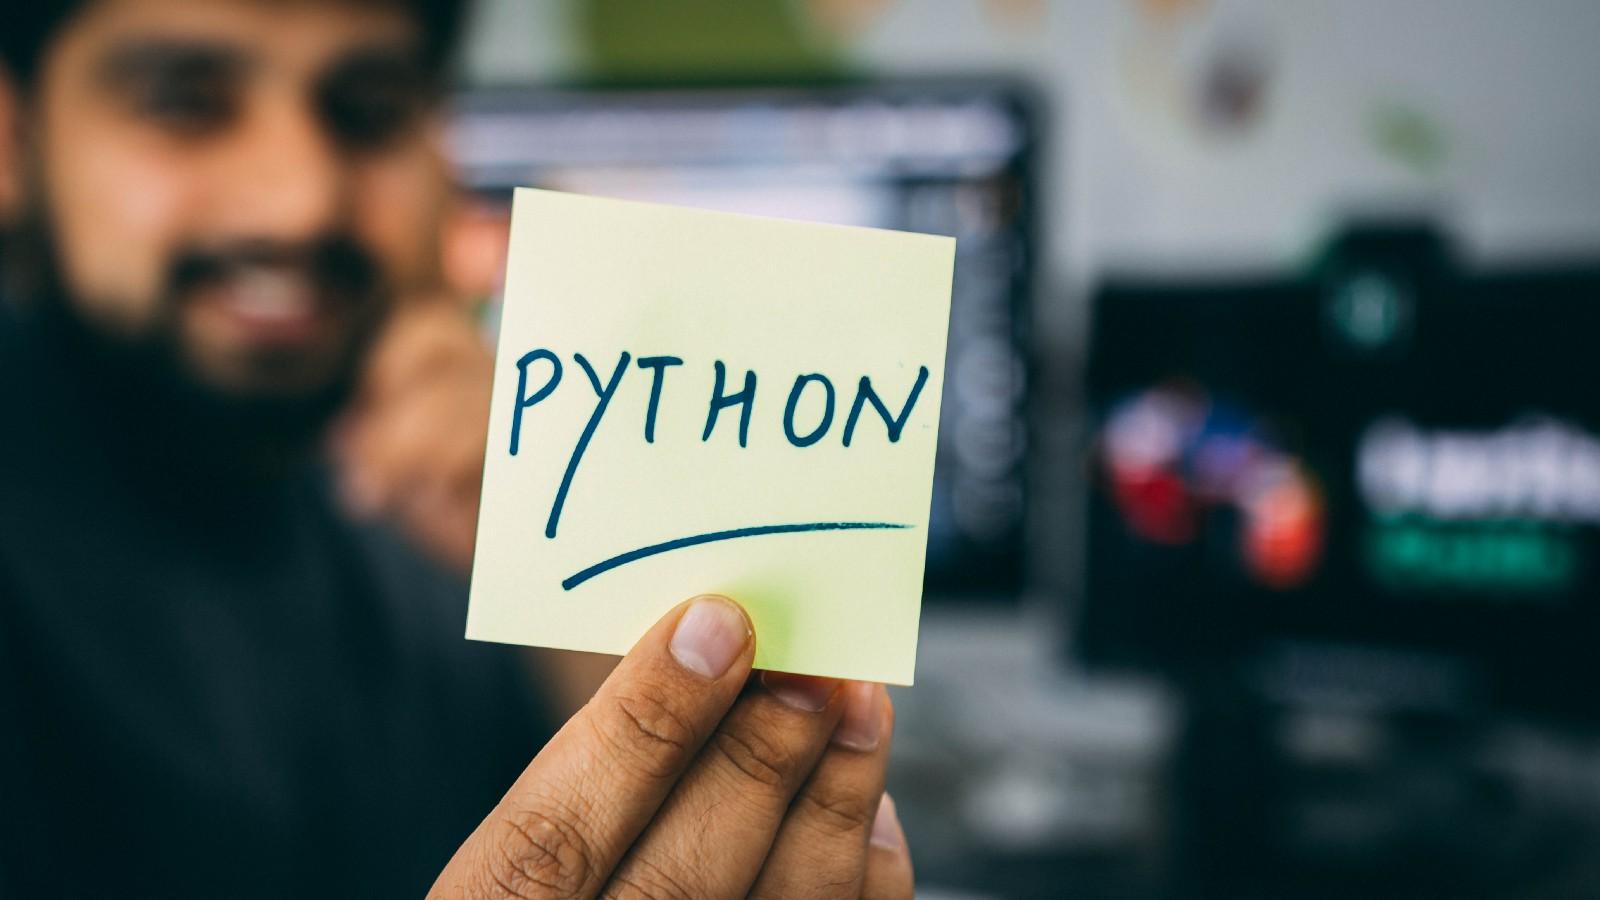 /i-1000th-idea-to-make-money-online-via-python-chained-sqlmaps-c8793a6897c2 feature image